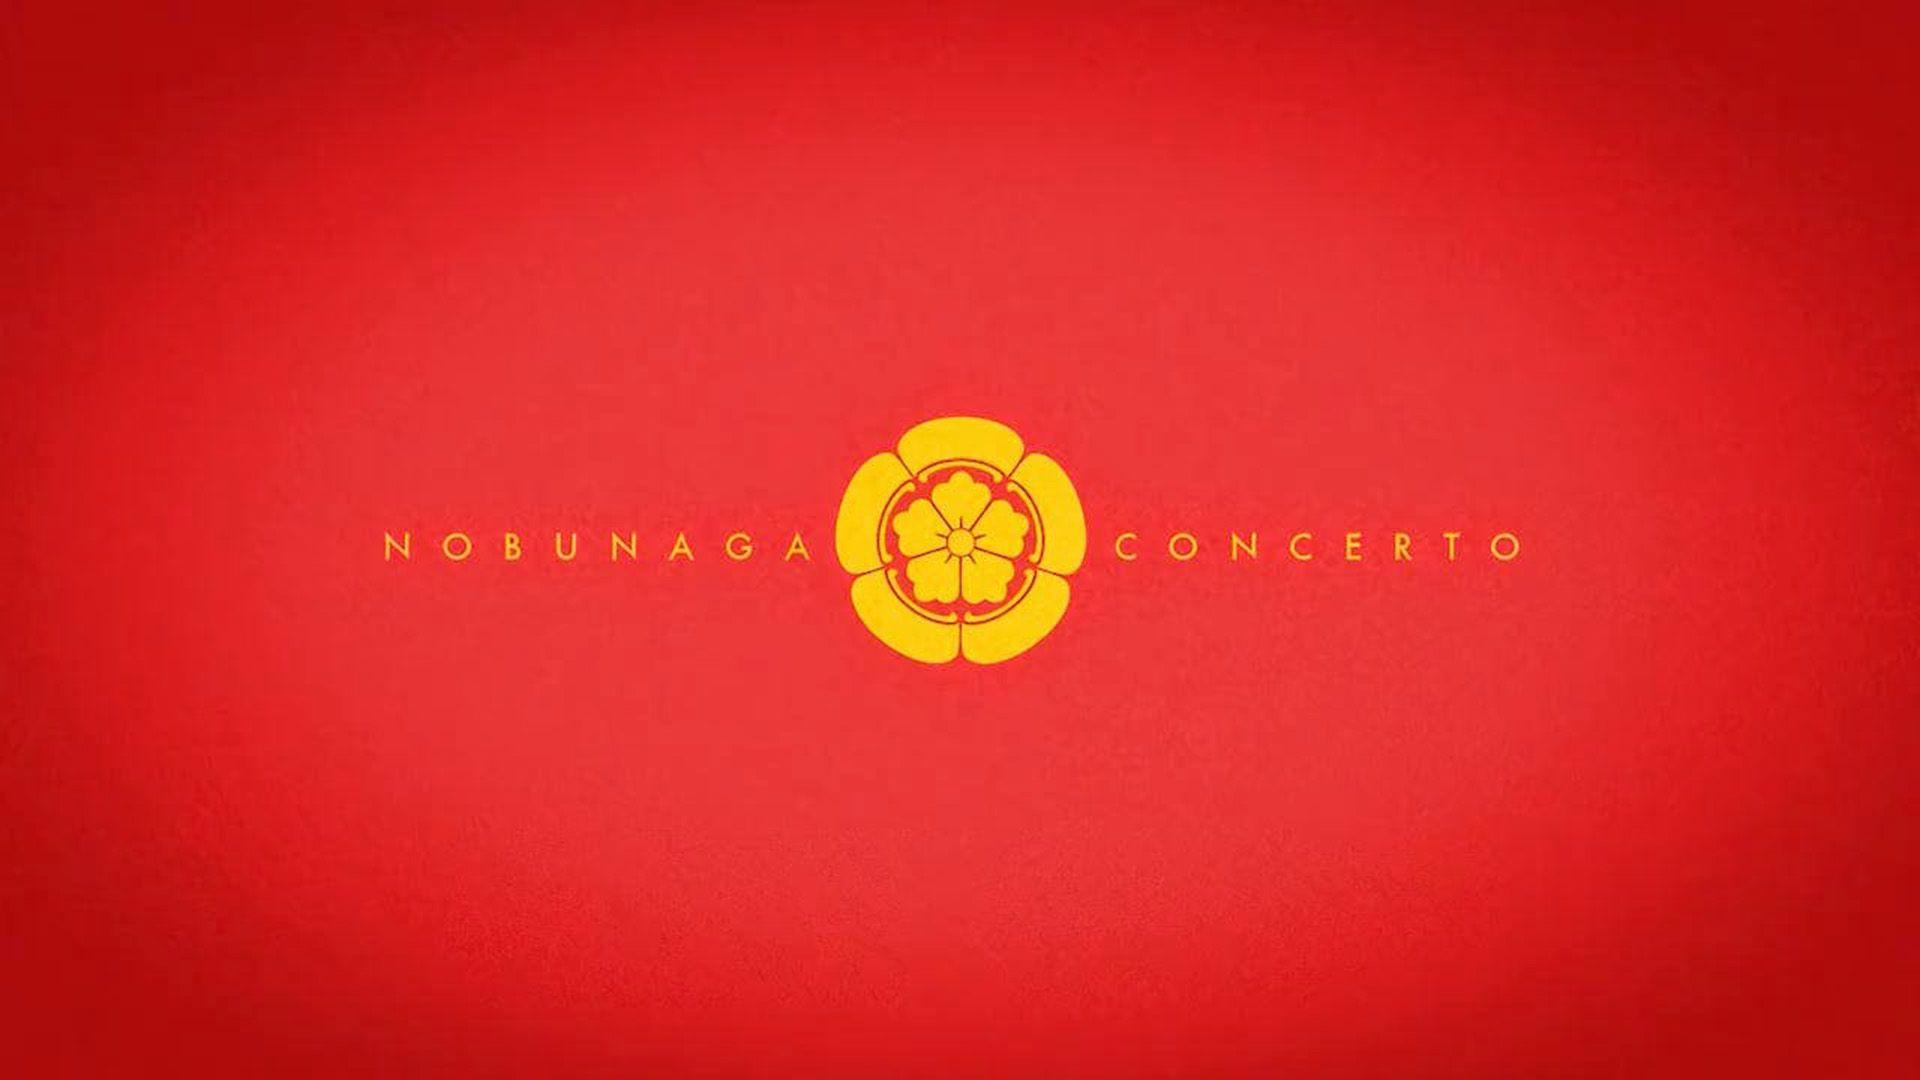 Autumn s concerto wallpaper - Wallpaper